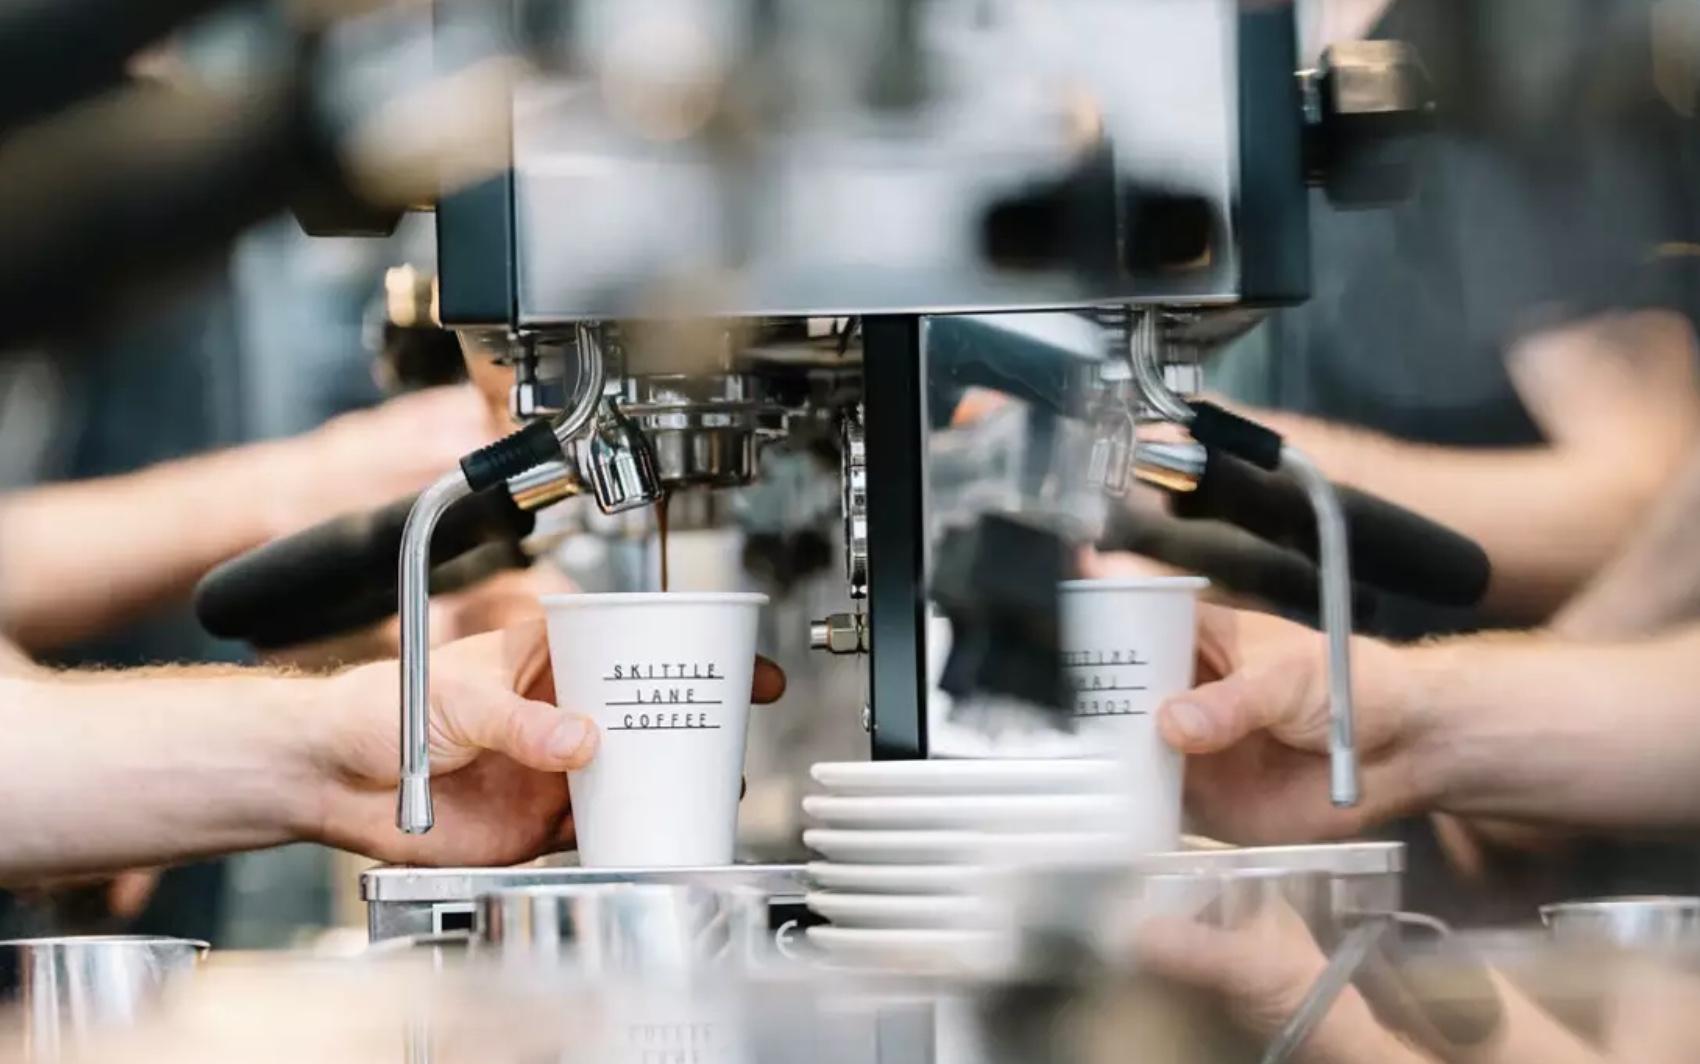 - MEET SKITTLELANE, SYDNEY'S NEWEST INNER CITY LANEWAY CAFE